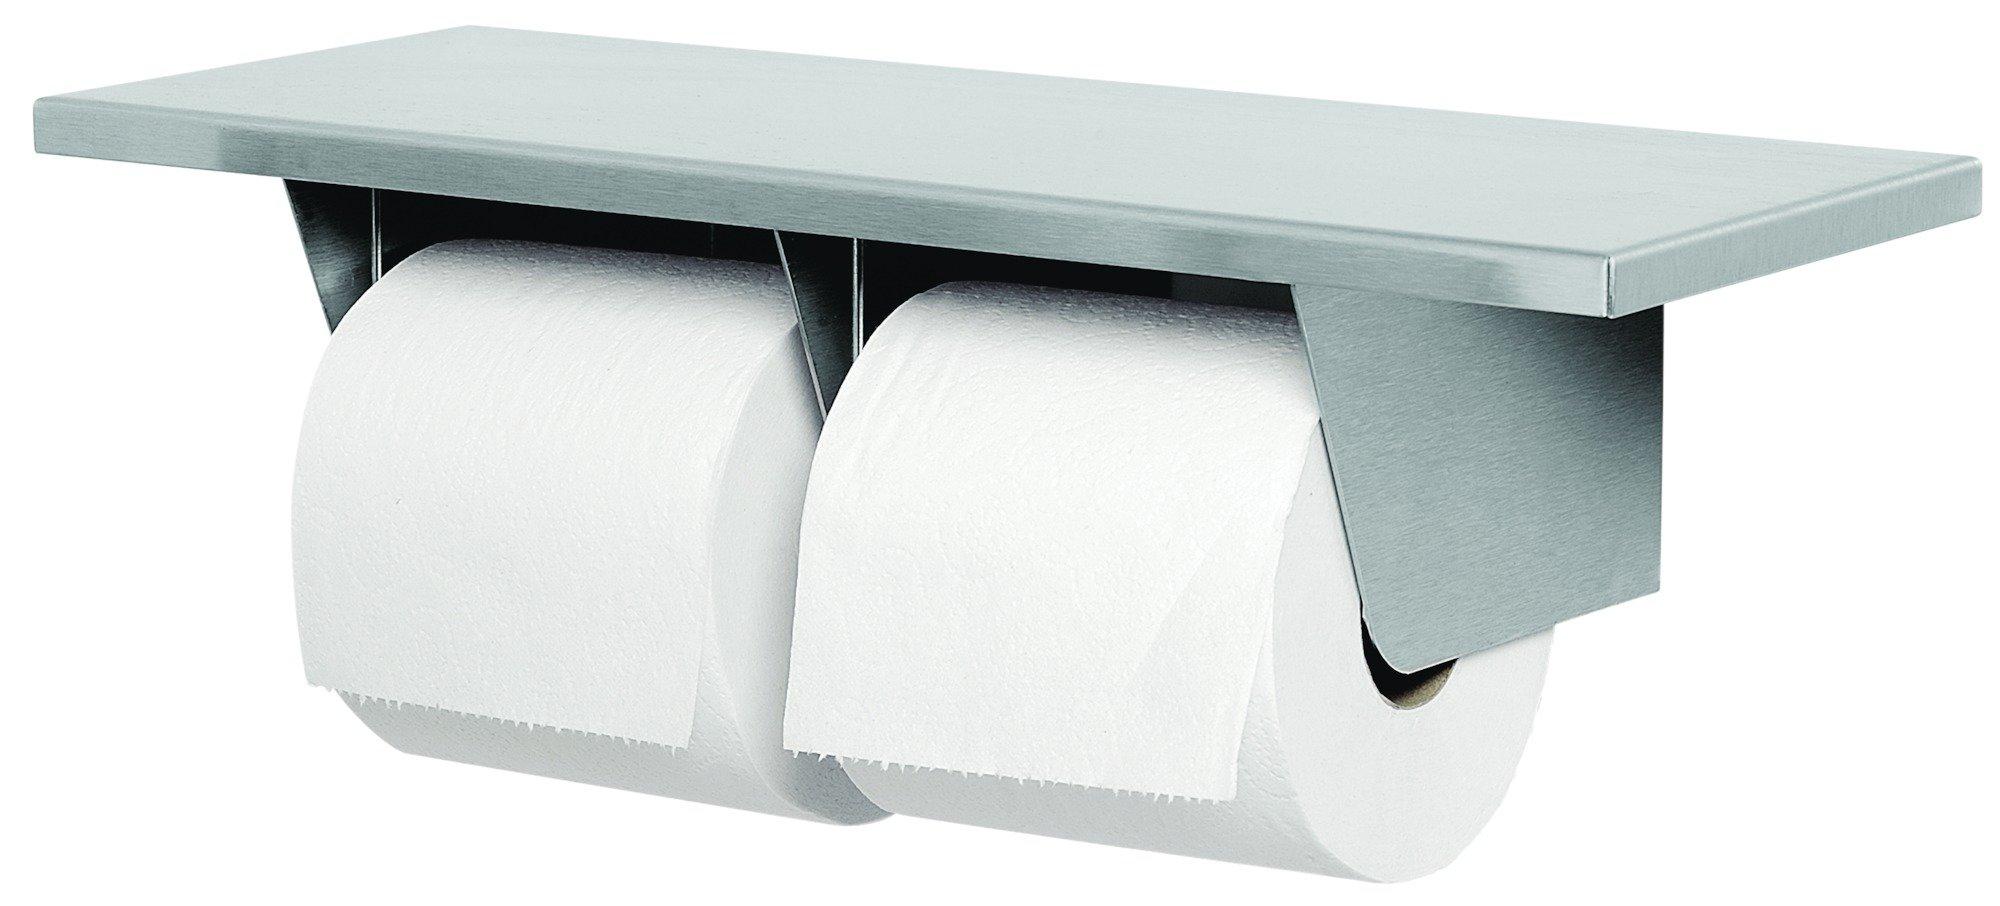 Dual Roll Toilet Paper Dispenser With Shelf 5263 | Accurate Door & Hardware